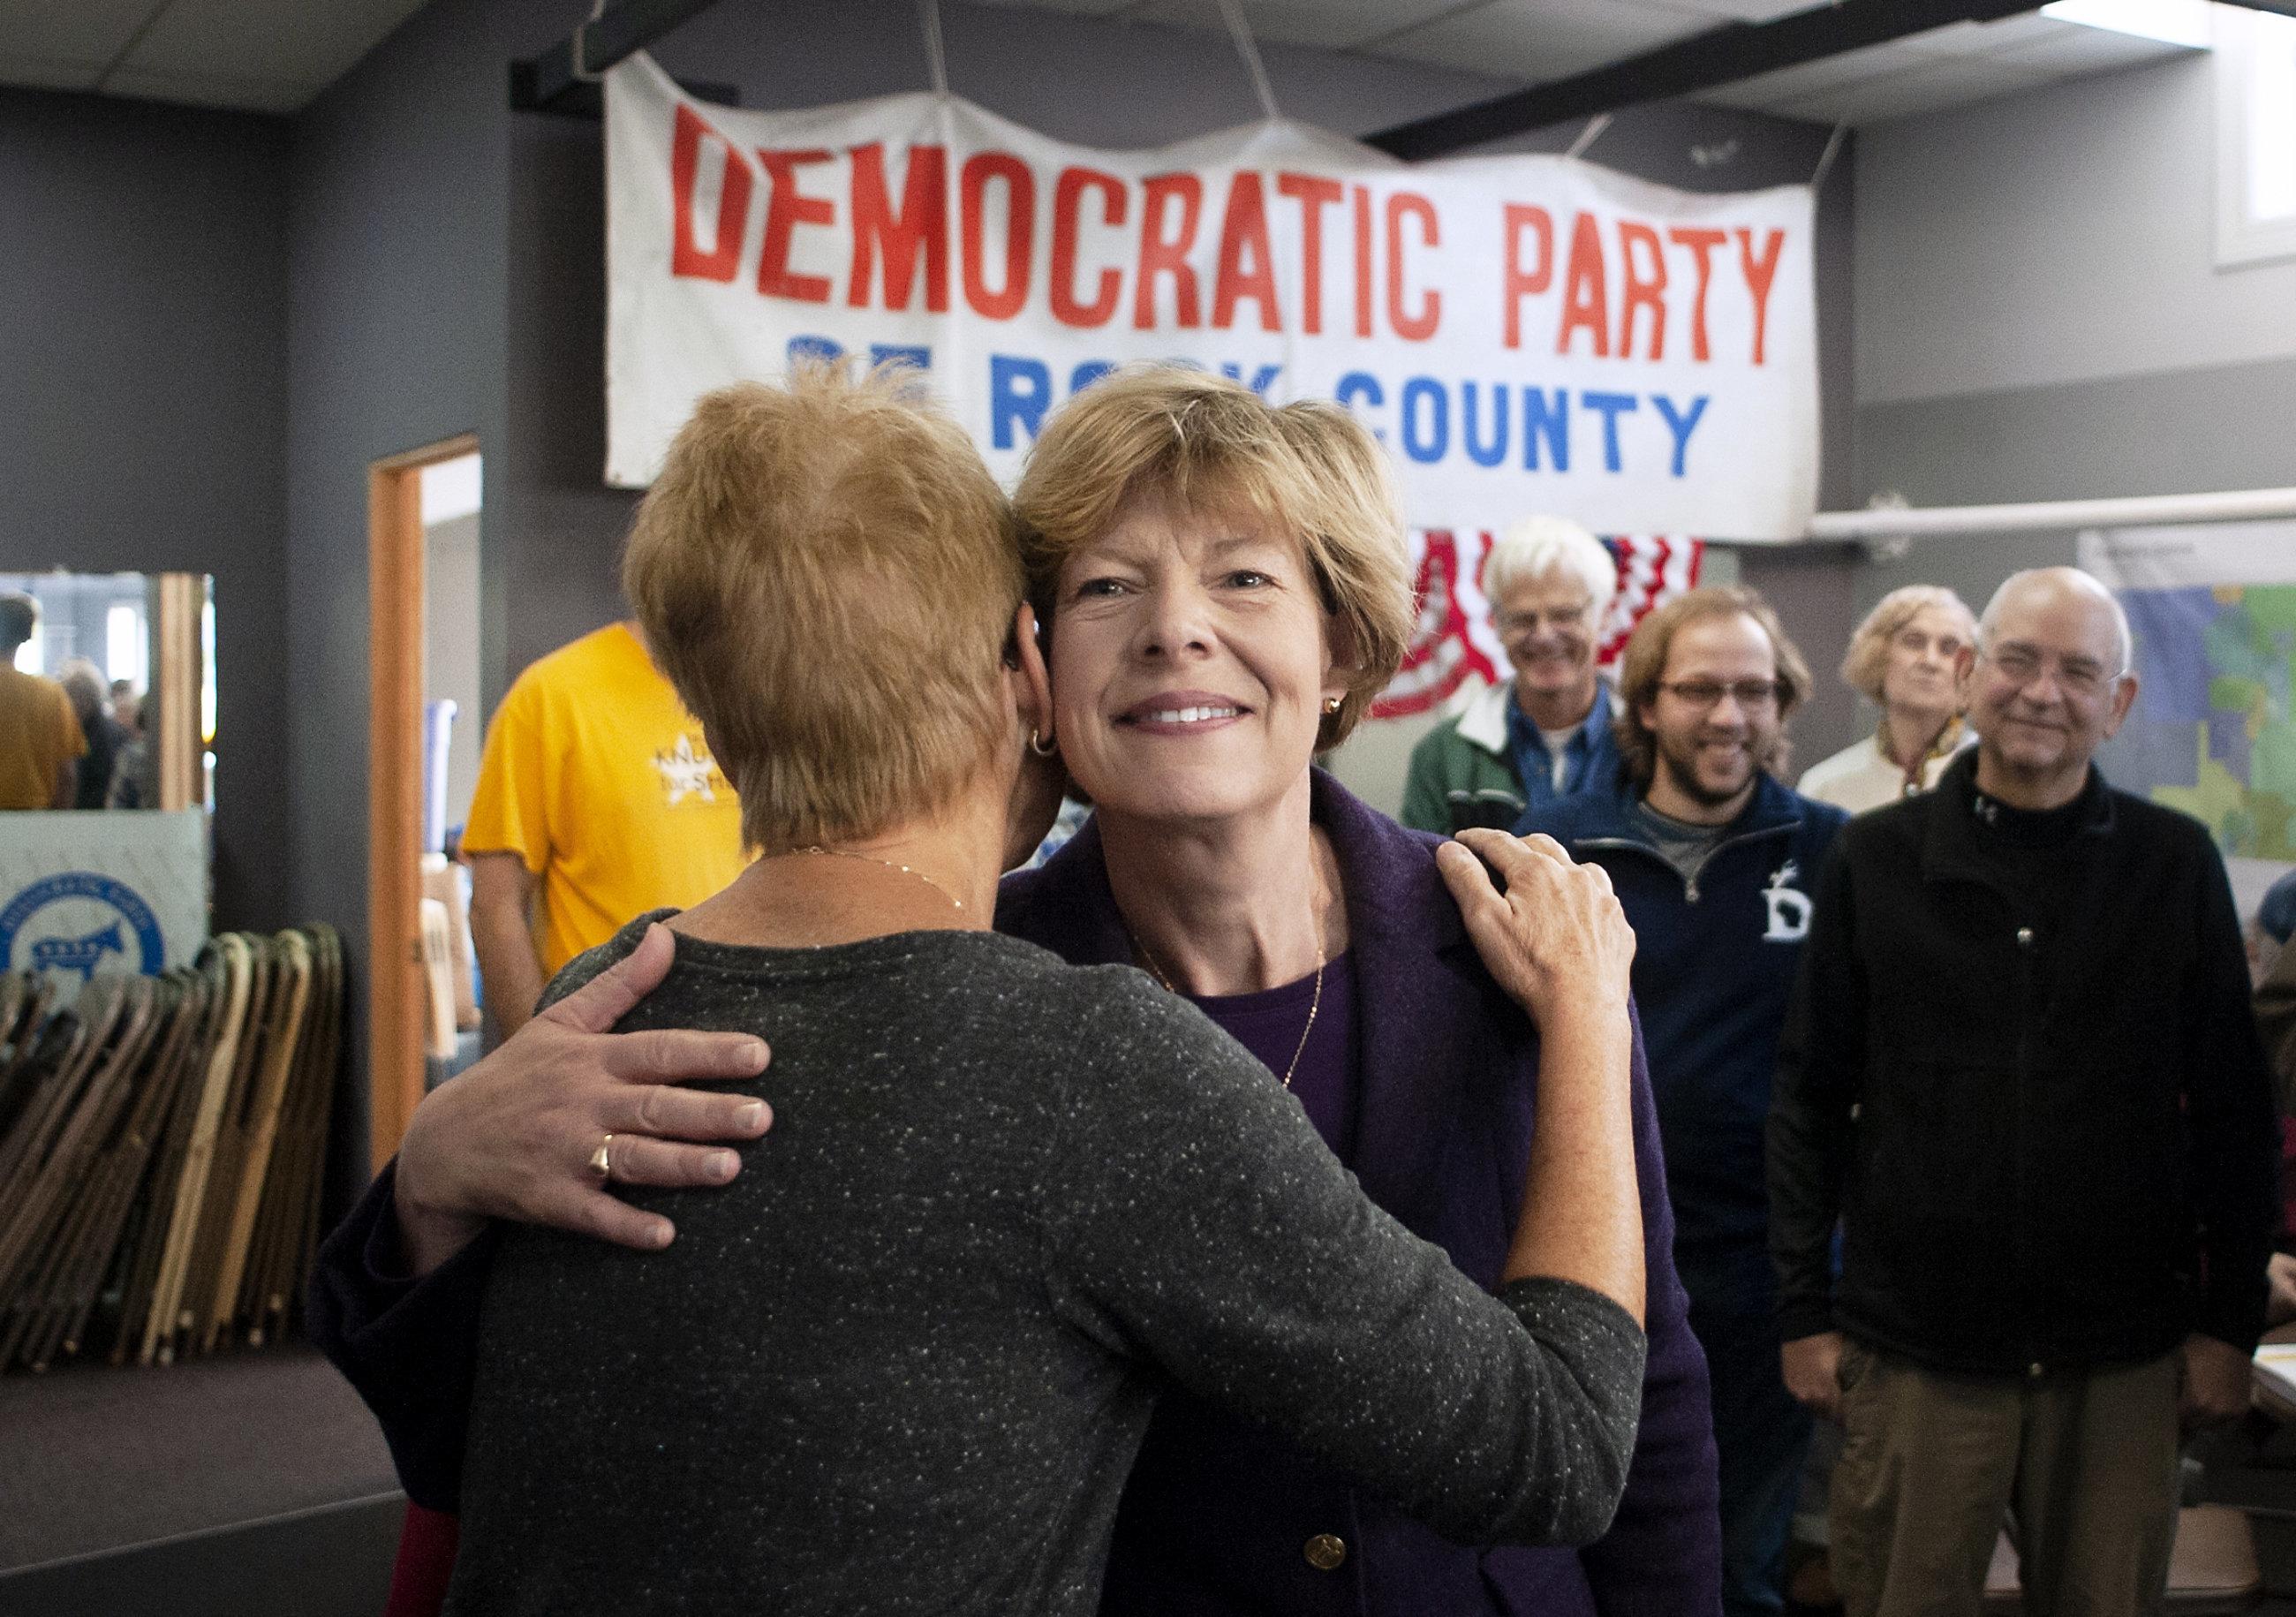 Sen. Tammy Baldwin (D-Wis.) won re-election to a second term.